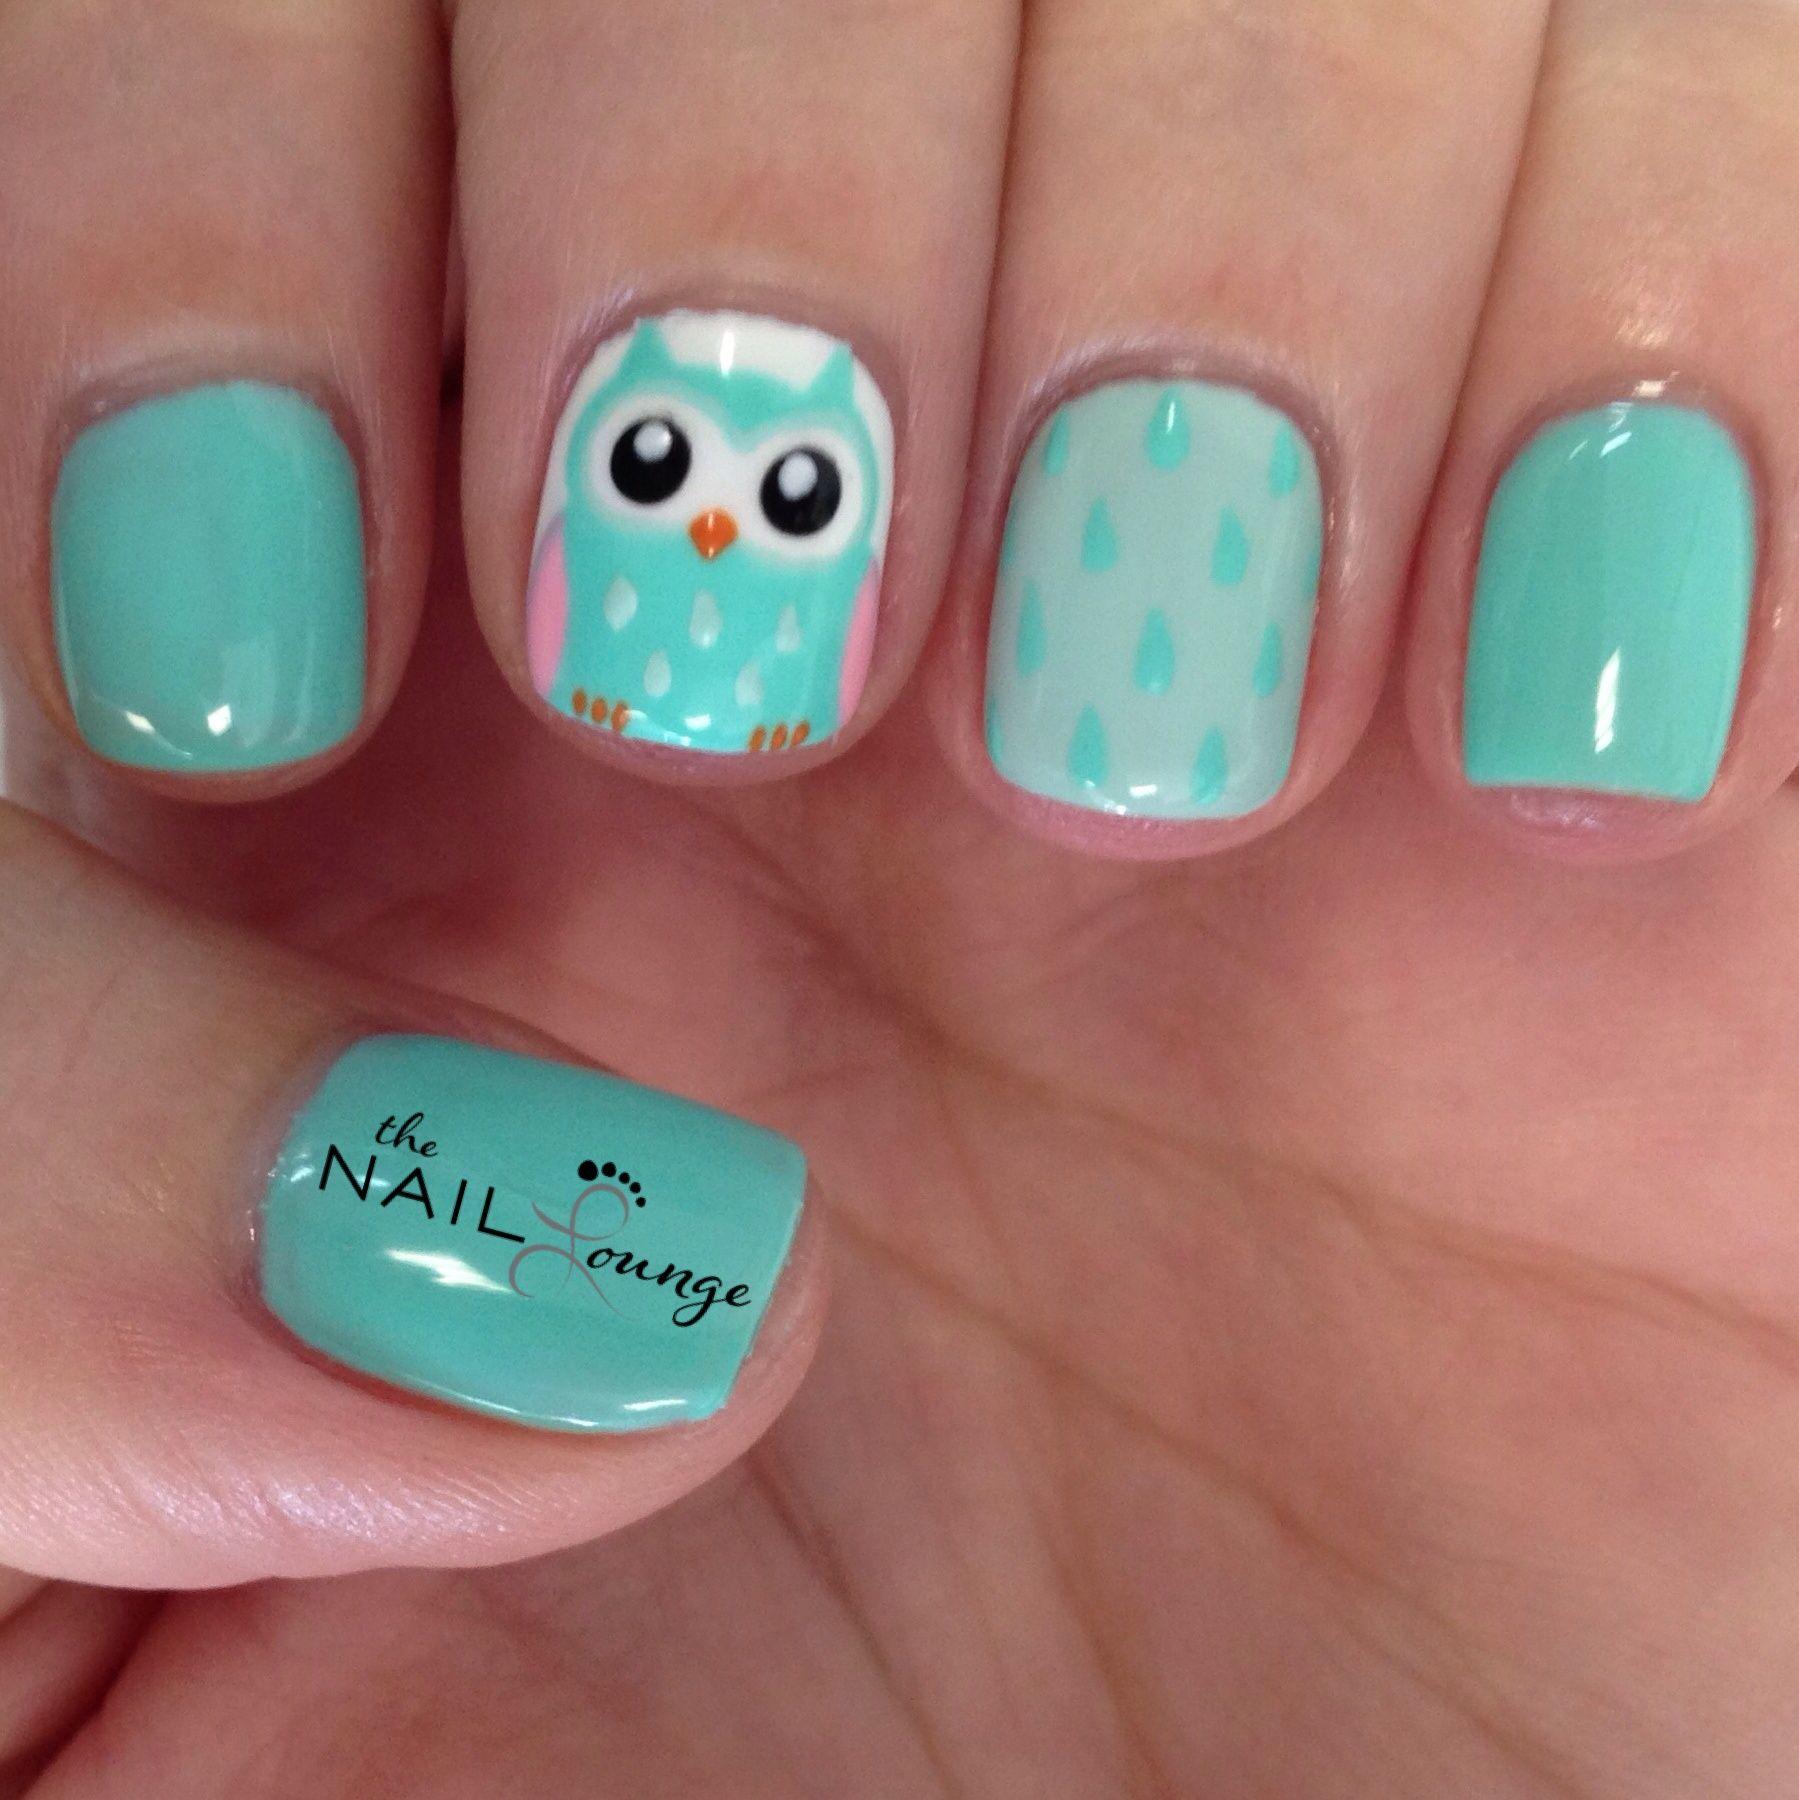 Cute owl cartoon nail art design thenailloungemiramar nails cute owl cartoon nail art design thenailloungemiramar prinsesfo Images